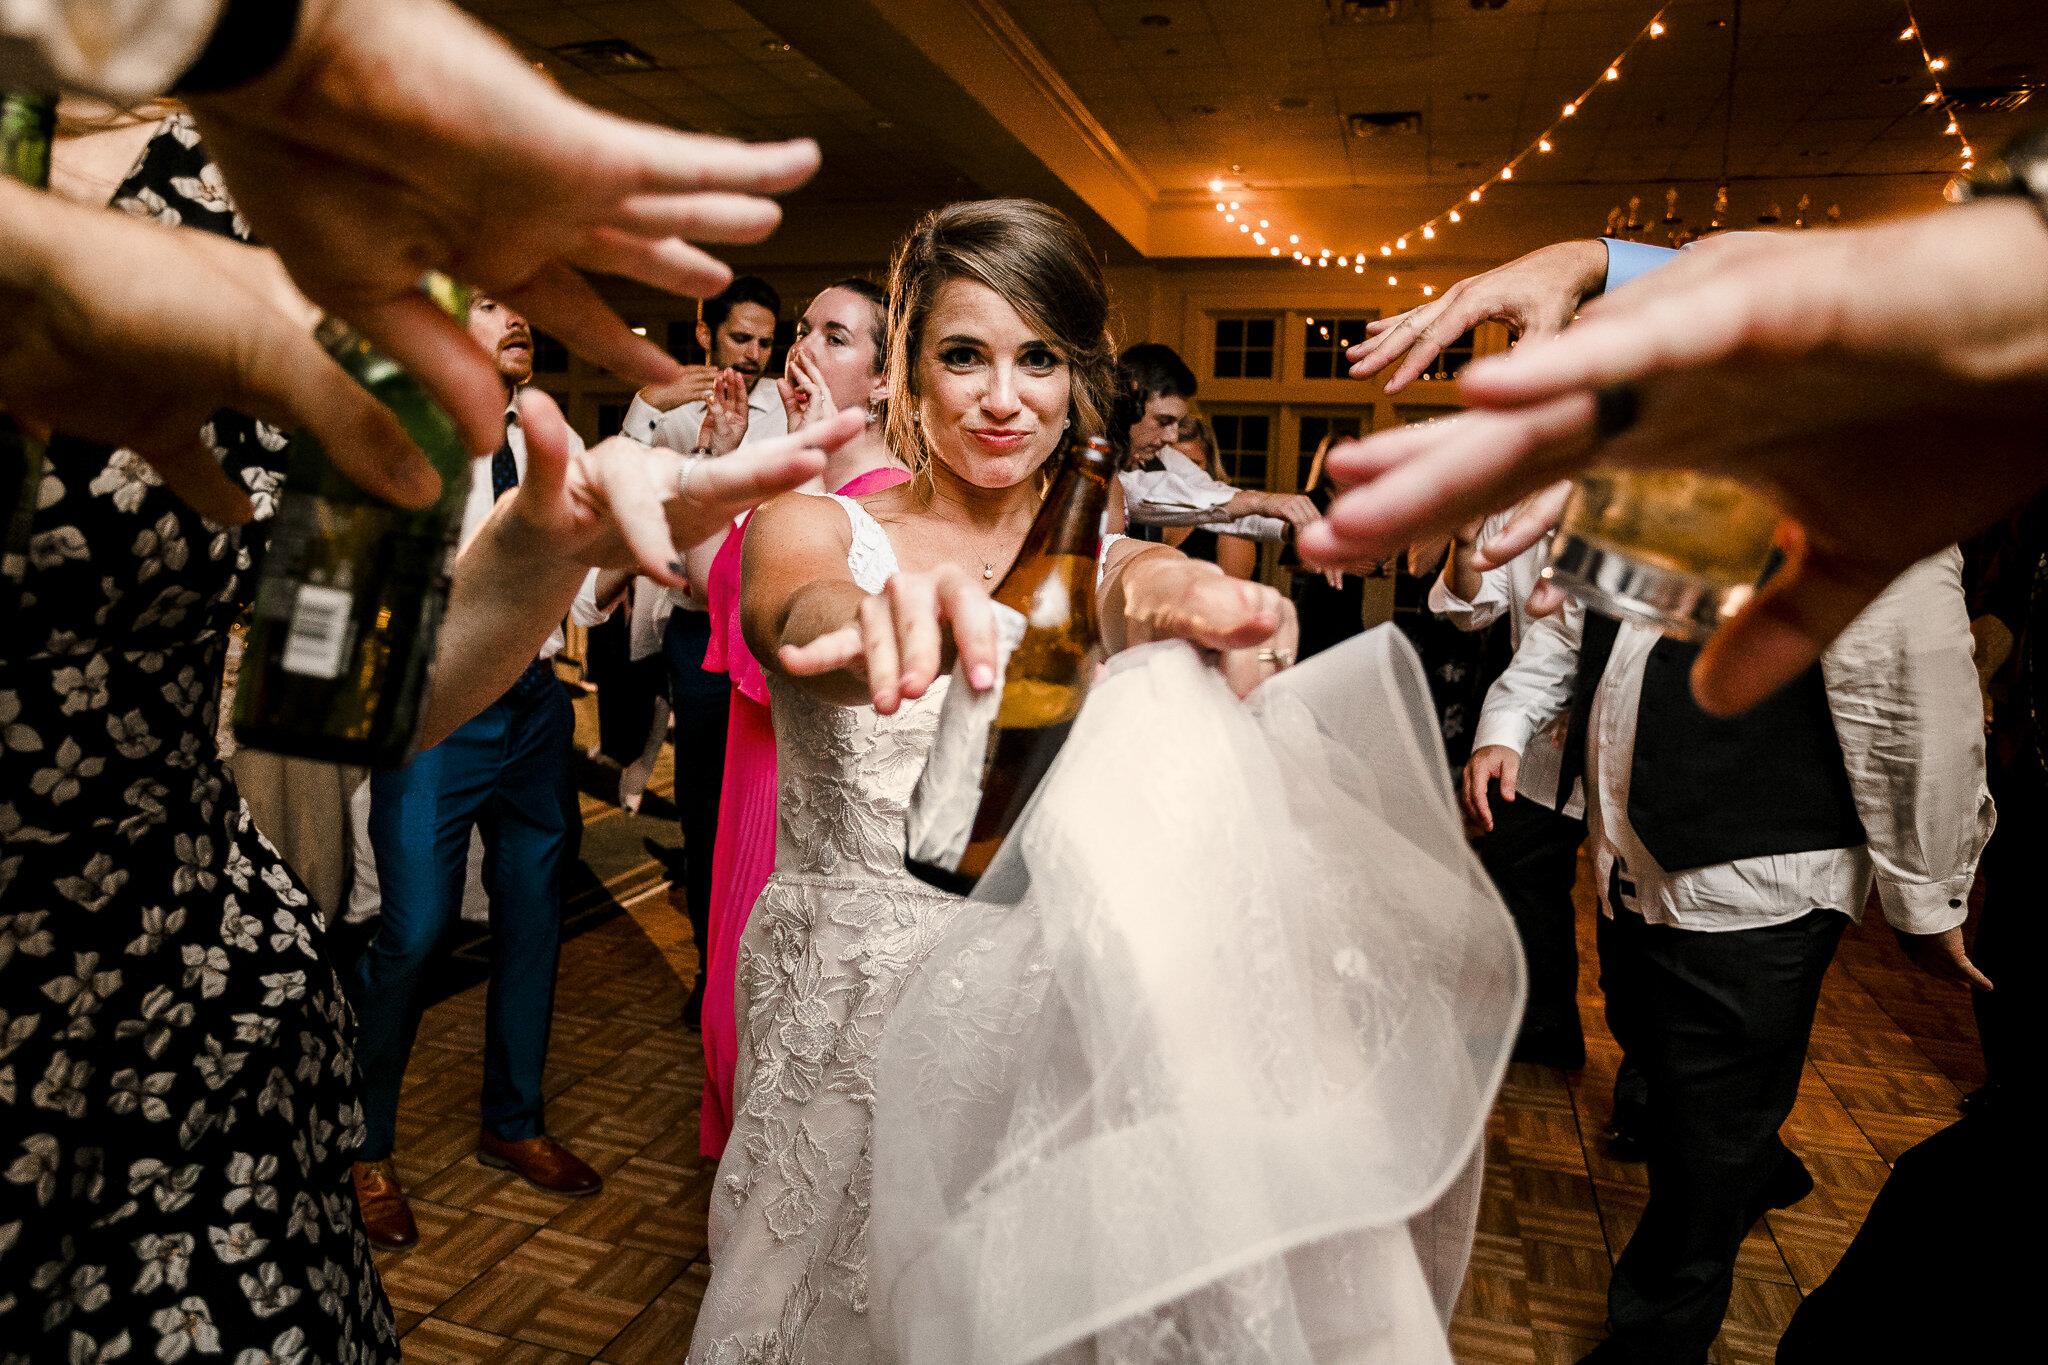 Coyle-Forsgate-Country-Club-Wedding-Photographer-58.JPG